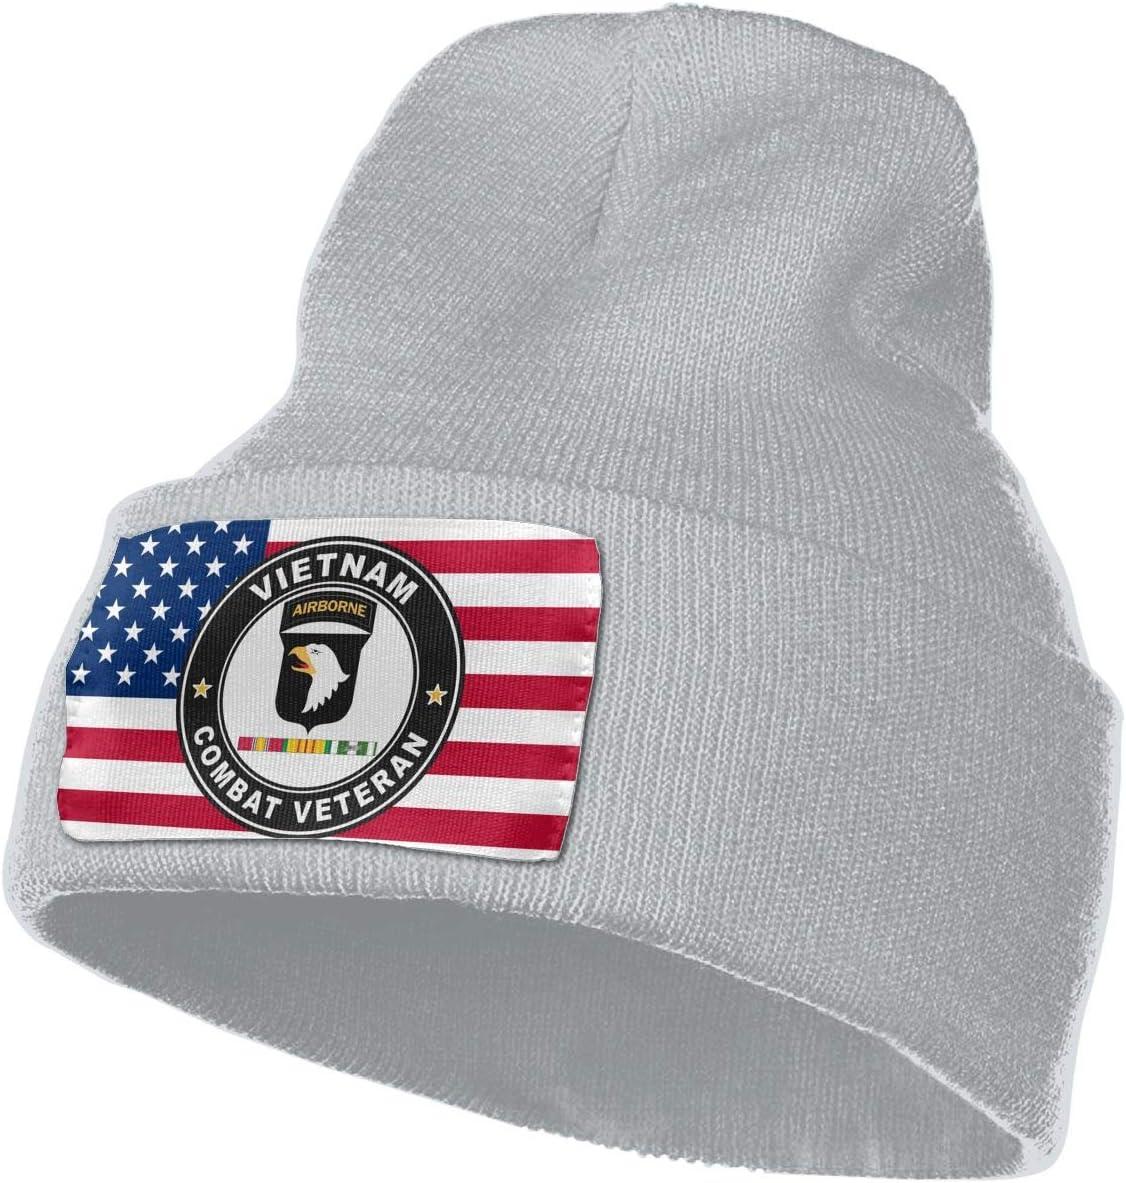 US Army 101st Airborne Division Vietnam Service Combat Veteran Men/&Women Warm Winter Knit Plain Beanie Hat Skull Cap Acrylic Knit Cuff Hat